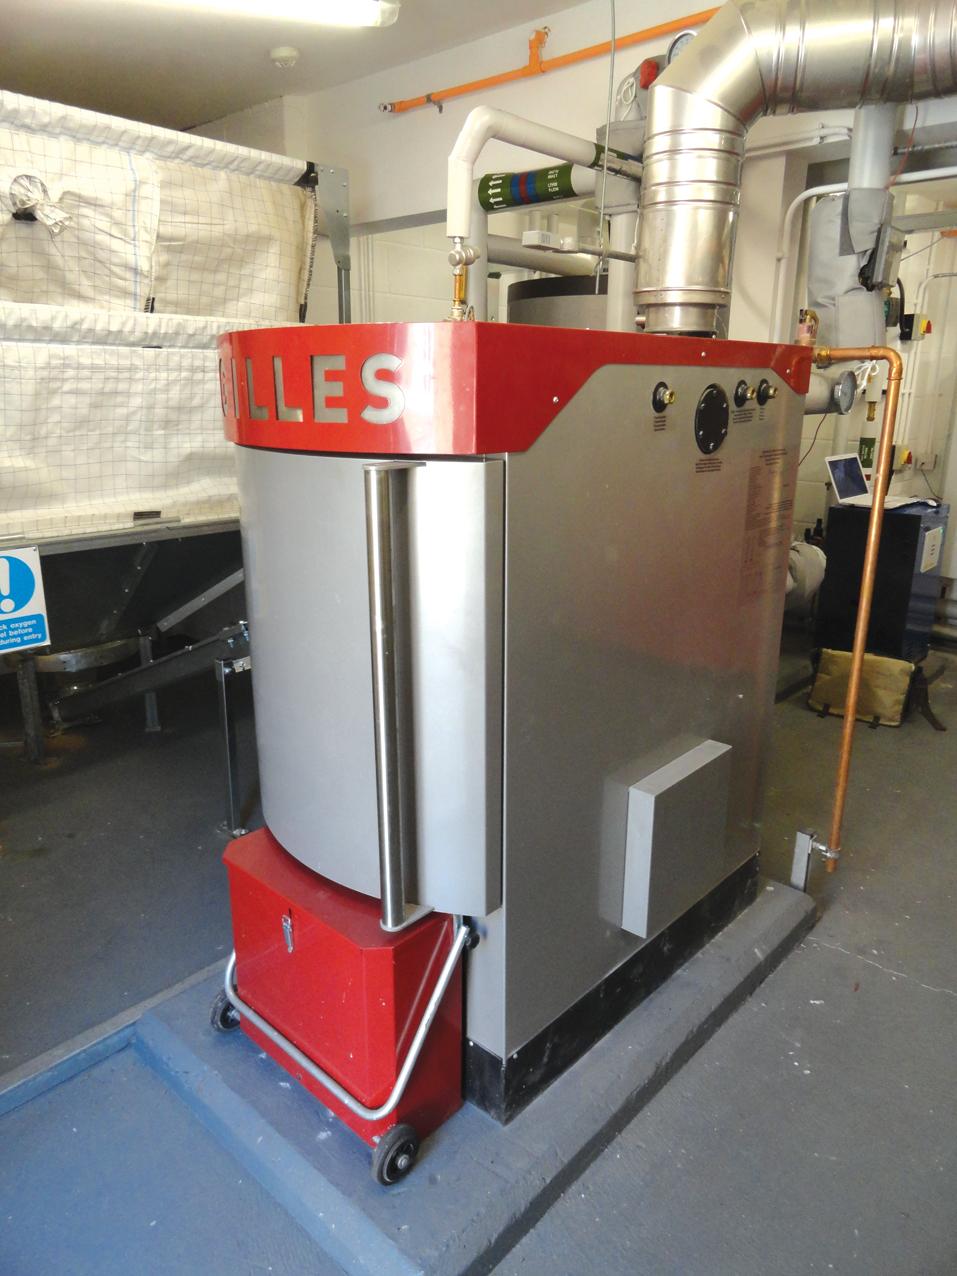 Is pellet boiler dangerous? 75